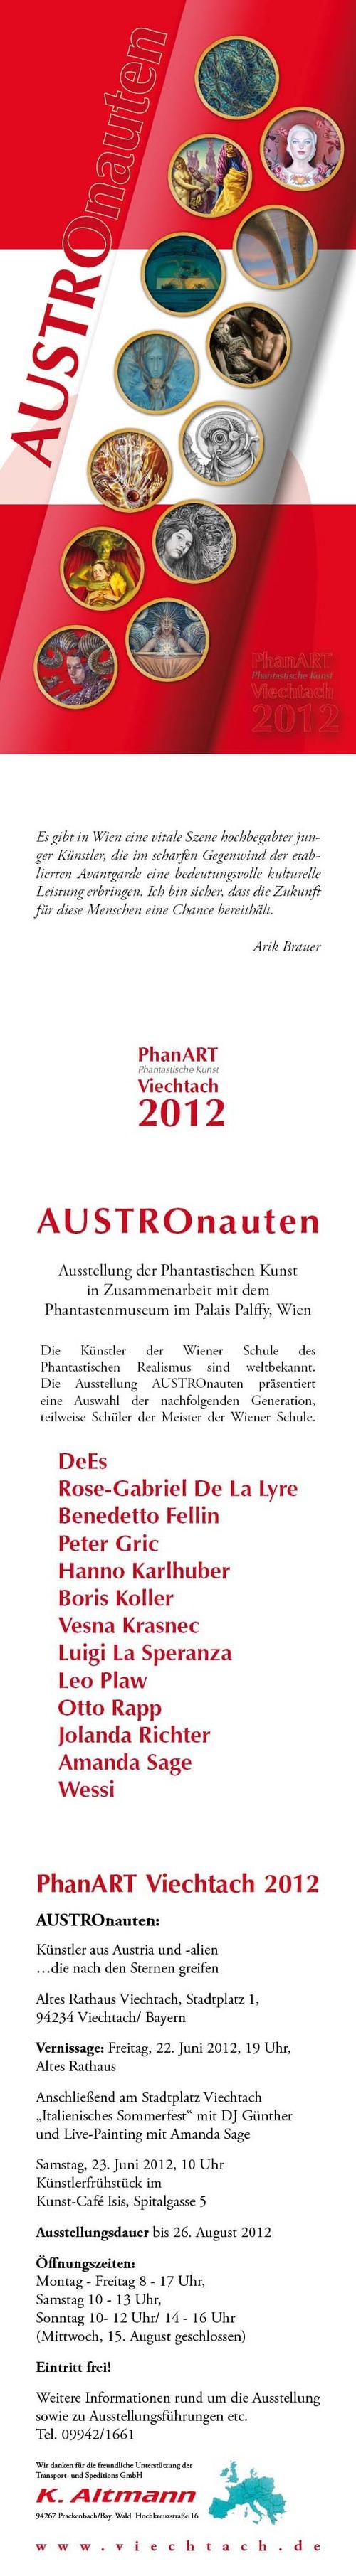 Einladung_austronauten_long